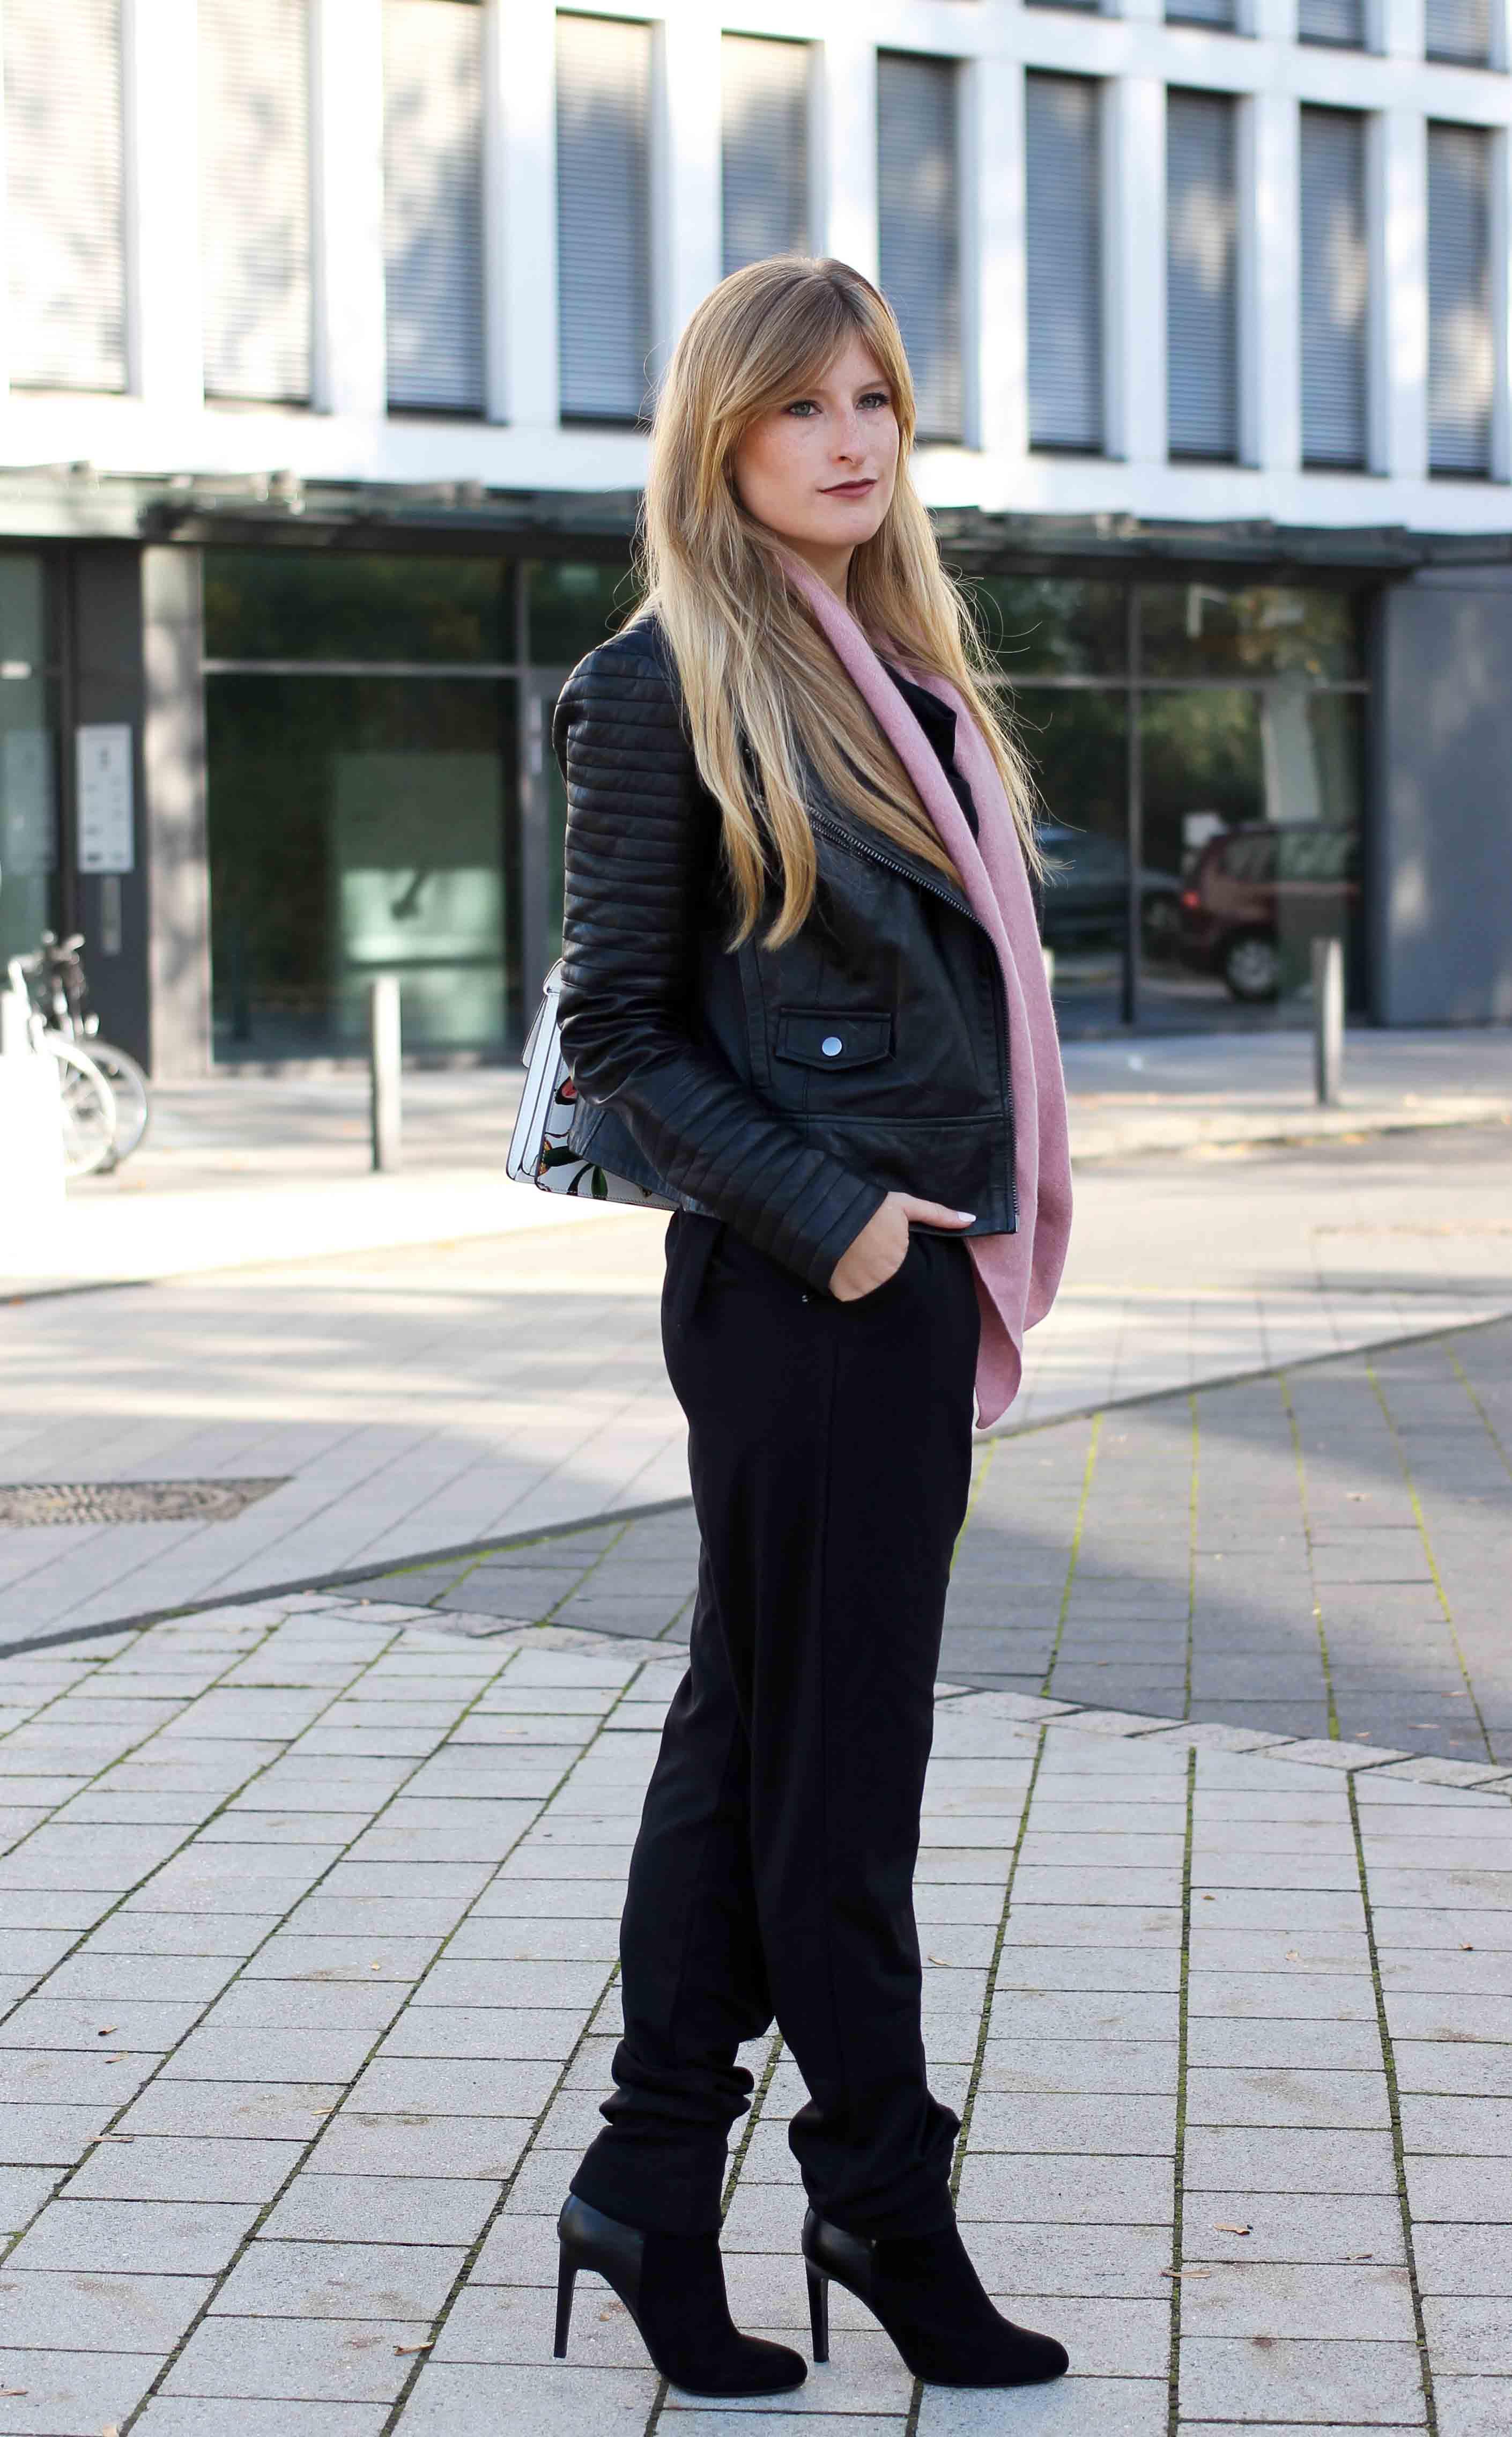 Schwarzer Jumpsuit rosa Kaschmir Schal Gucci Dionysus Garden Print Lederjacke Modeblog Outfit Herbsttrend 9